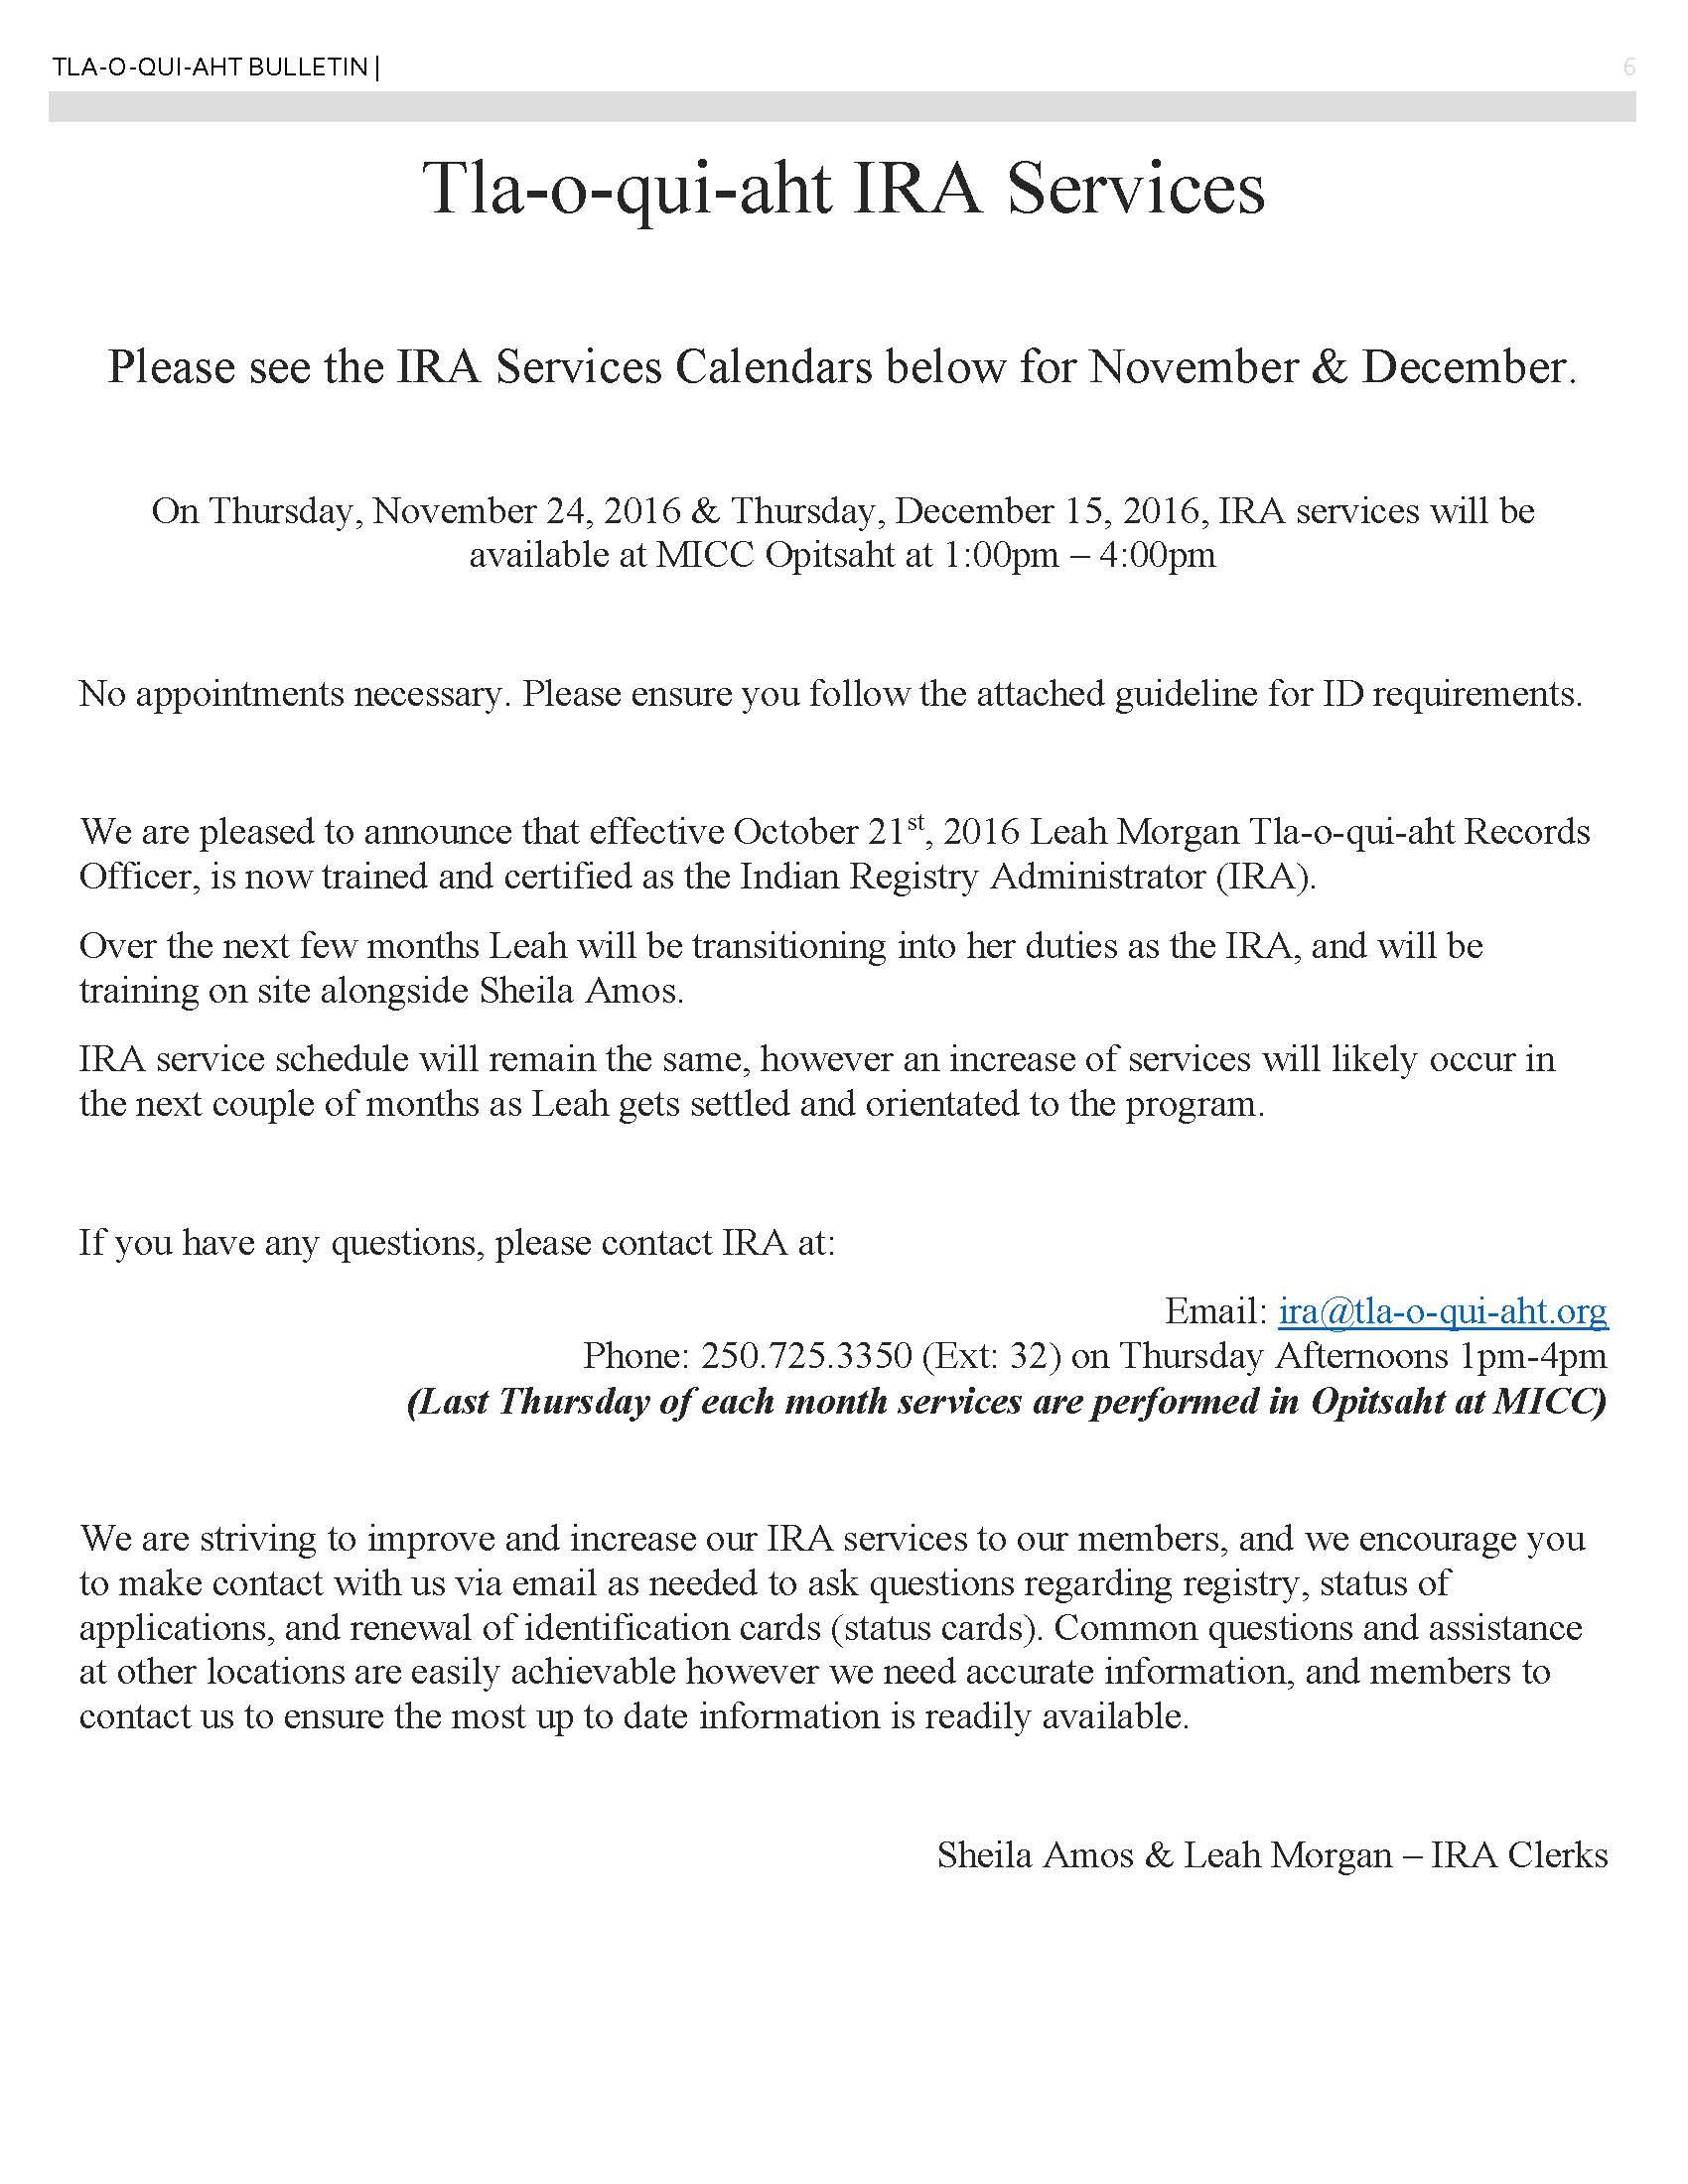 TFN Bulletin Nov 1st 2016_Page_06.jpg